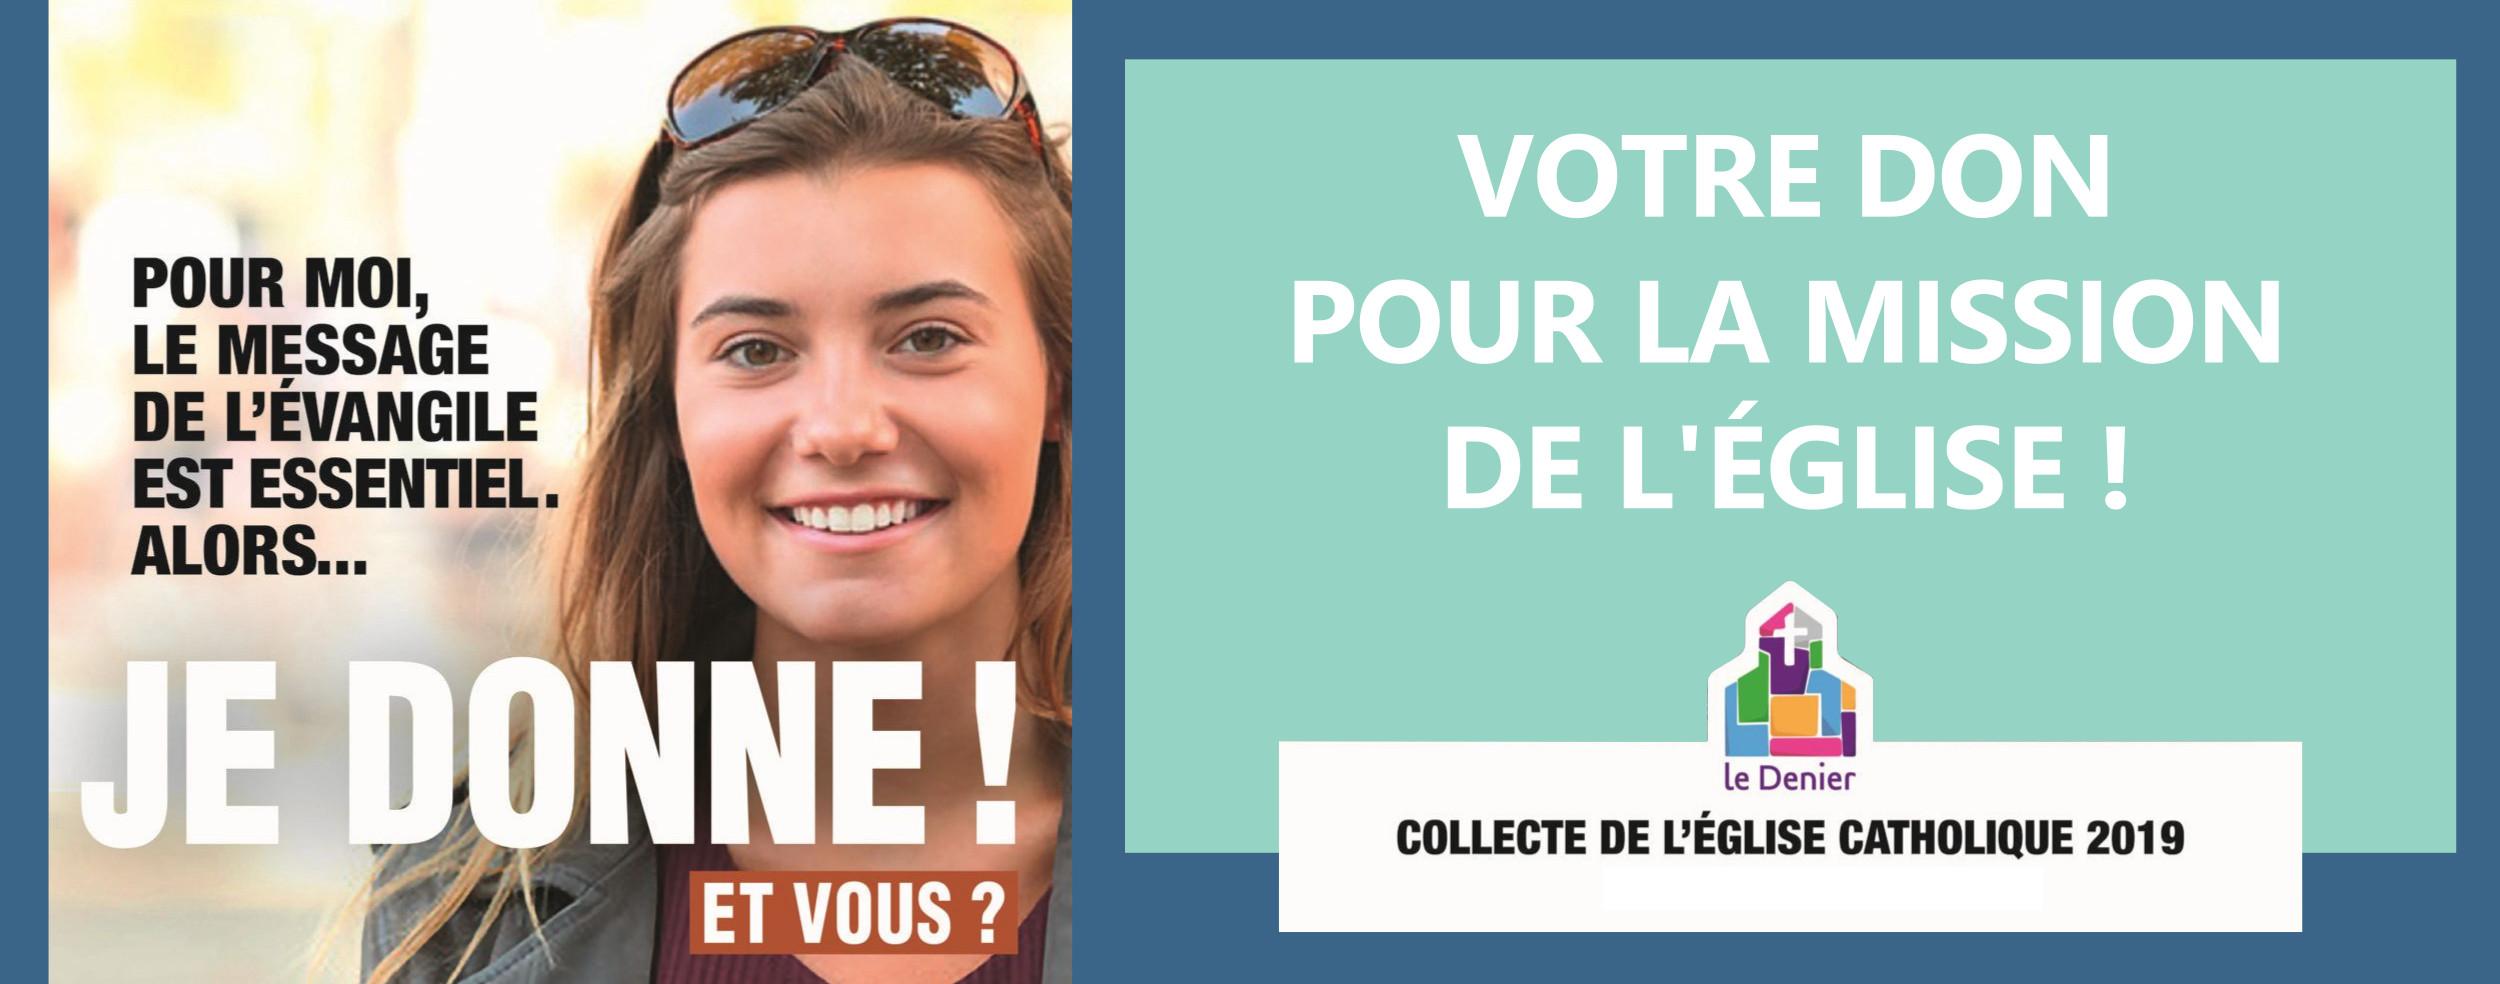 Don au denier 2019